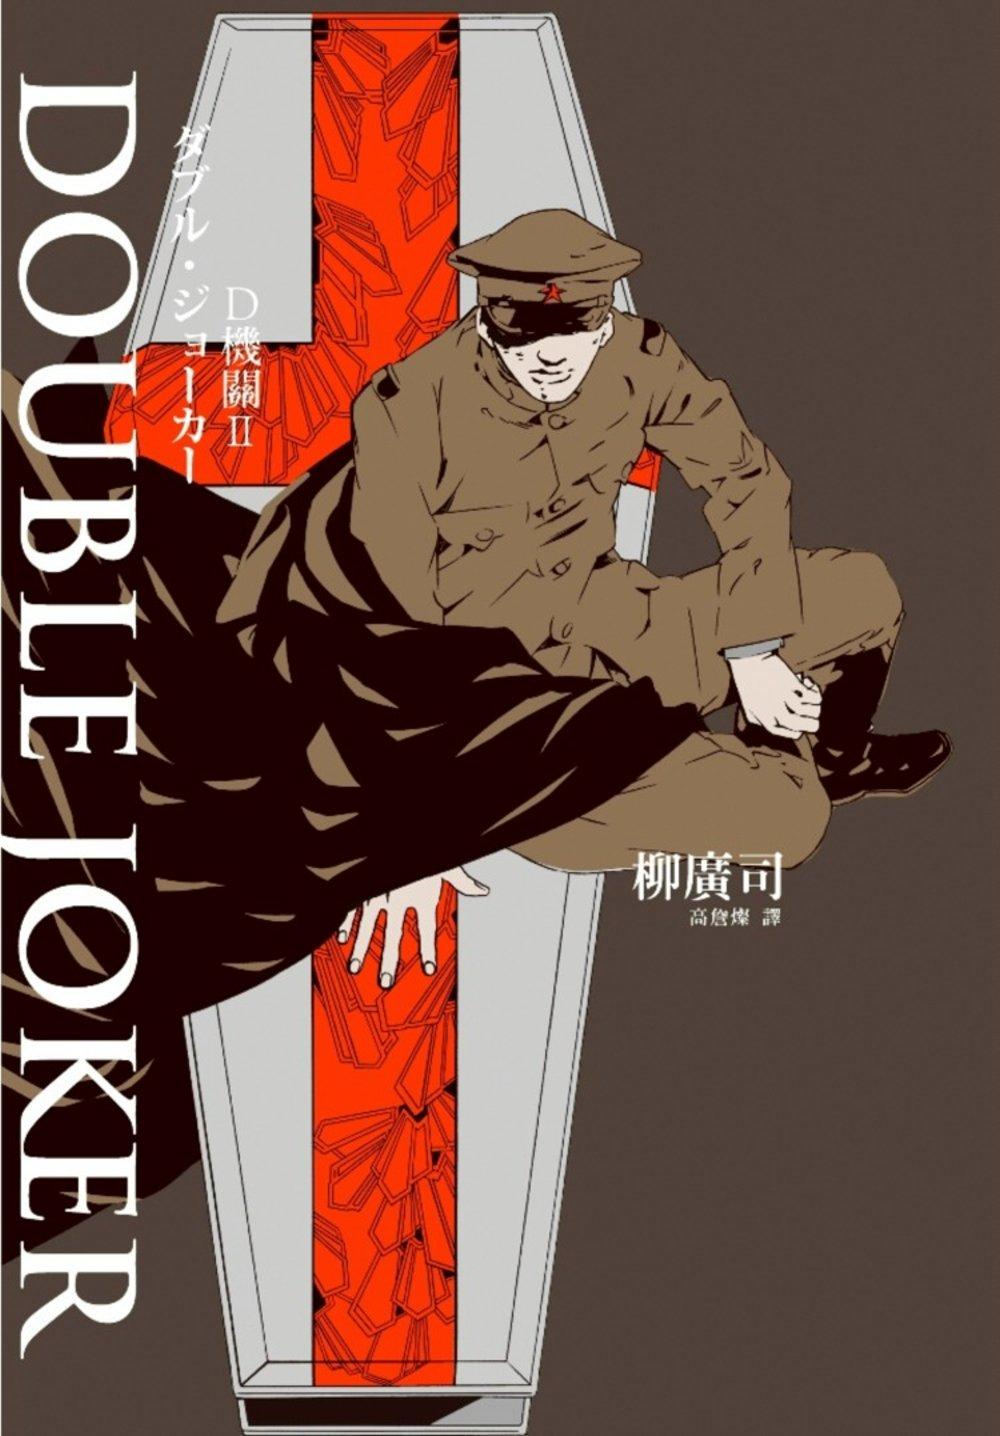 D機關2-DOUBLE JOKER